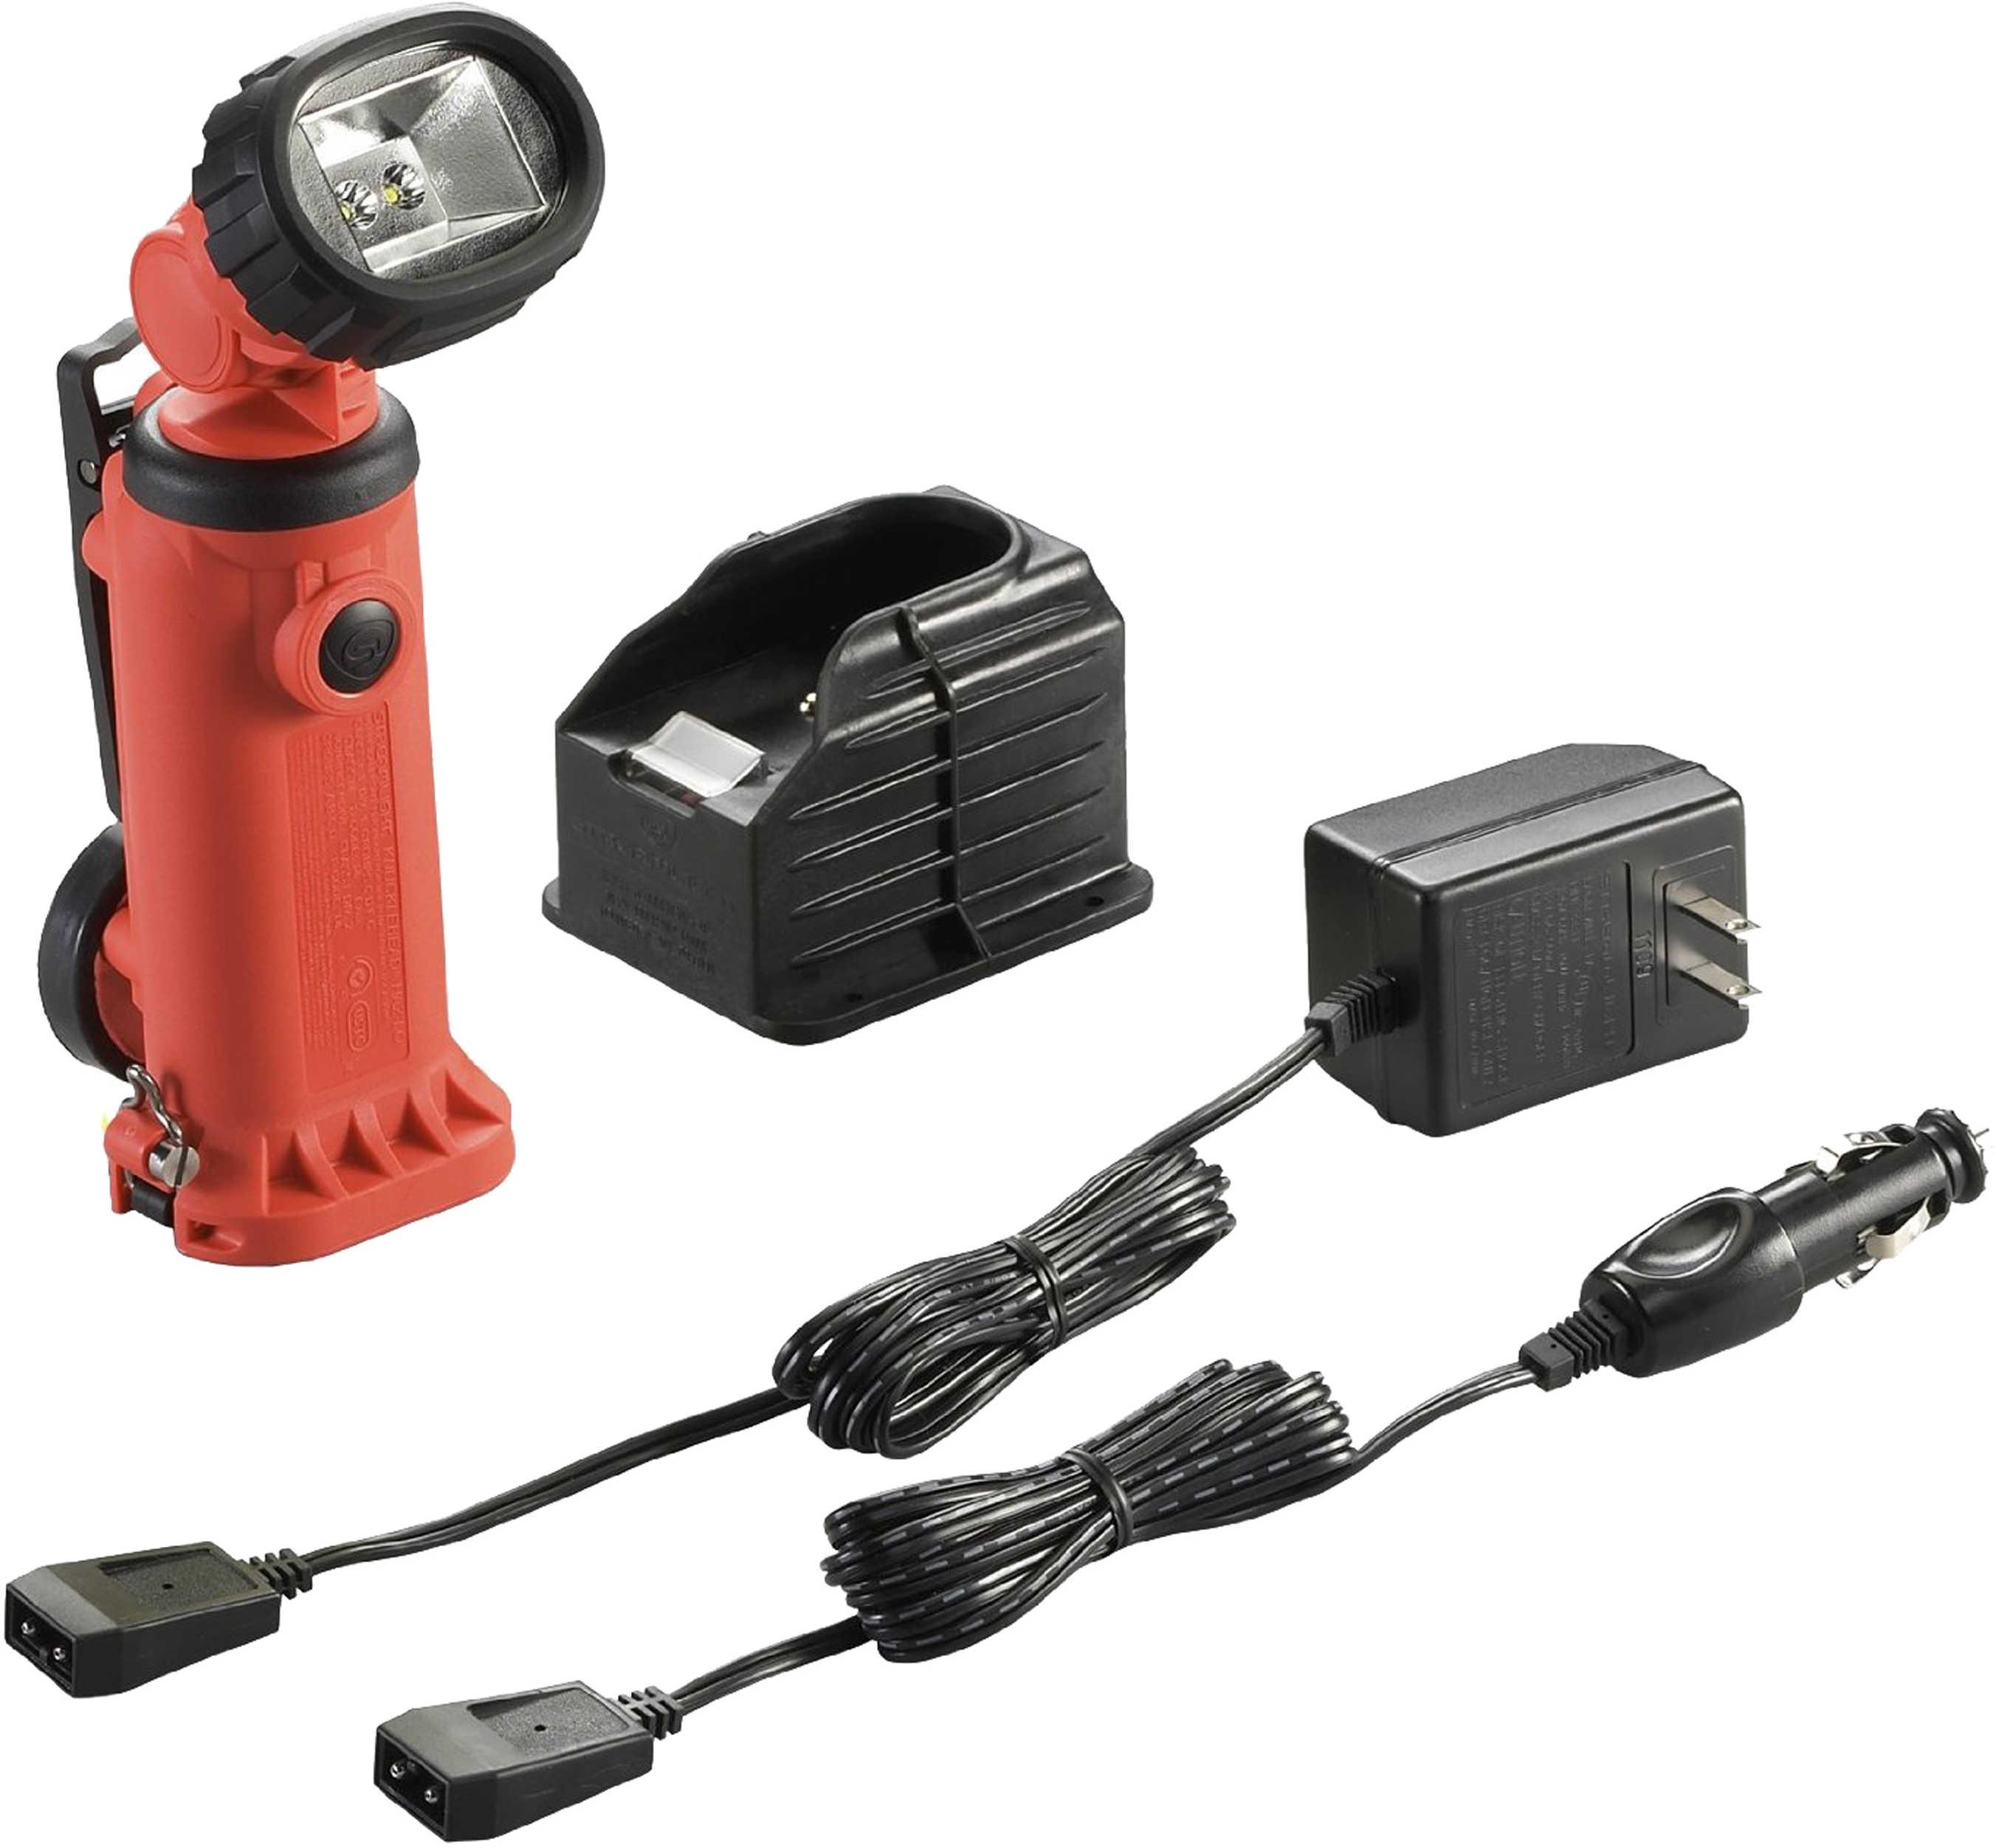 Streamlight Knucklehead HAZ-LO Light Flood 120V AC/12V DC, Orange 91657